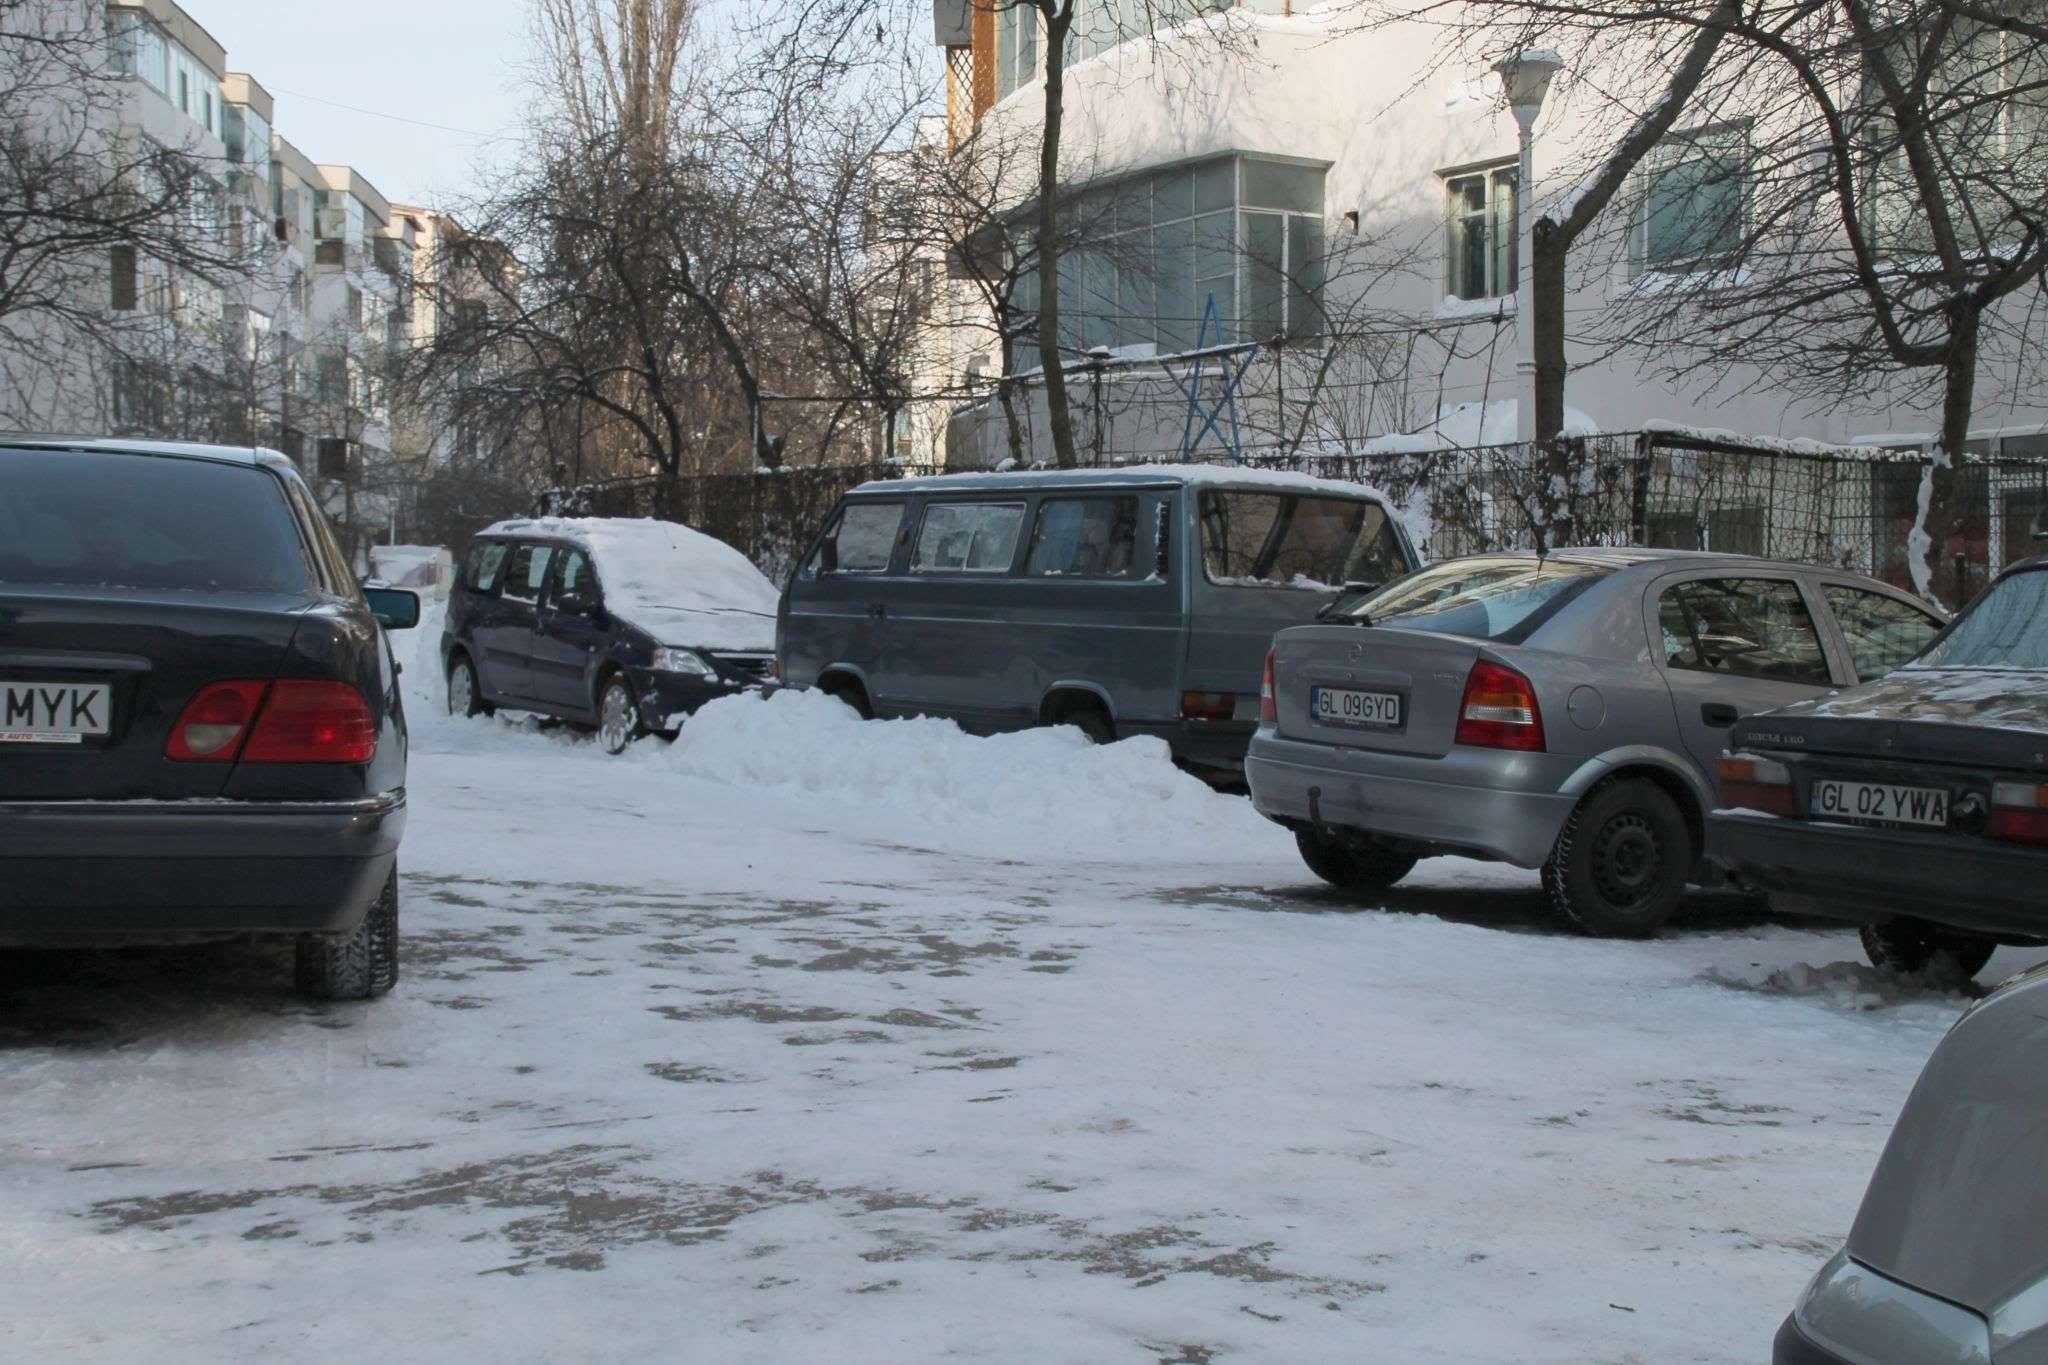 Mare-i minunea ta, Doamne!...masini si parcare deszapezite! 01.02.2014